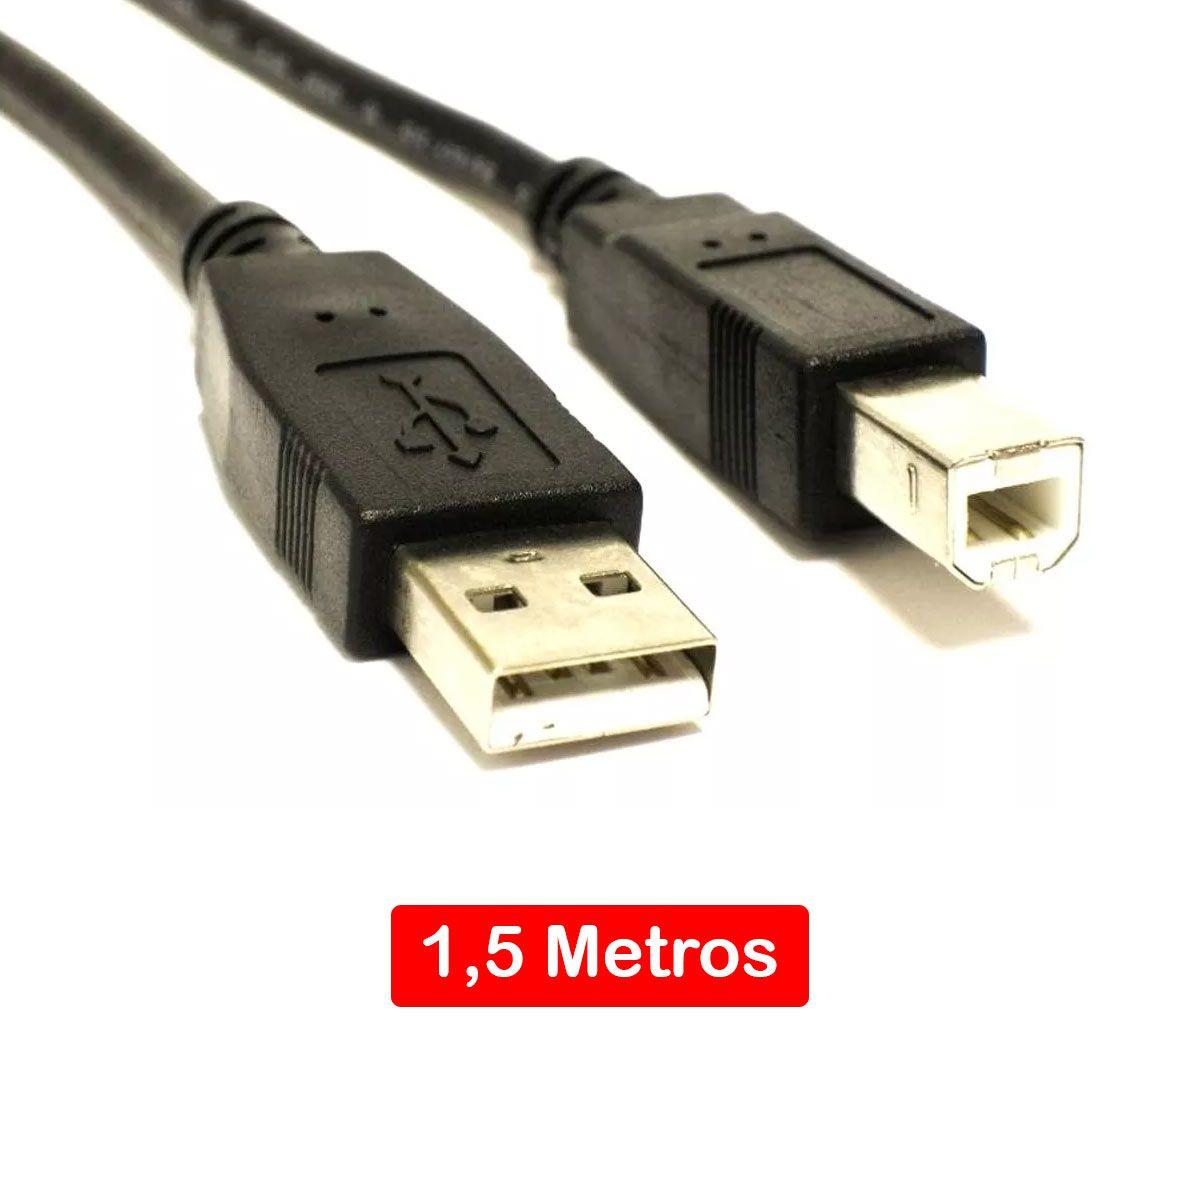 Cabo Arduino Uno USB / Mega / Impressora / Scanner - 1,5 metros